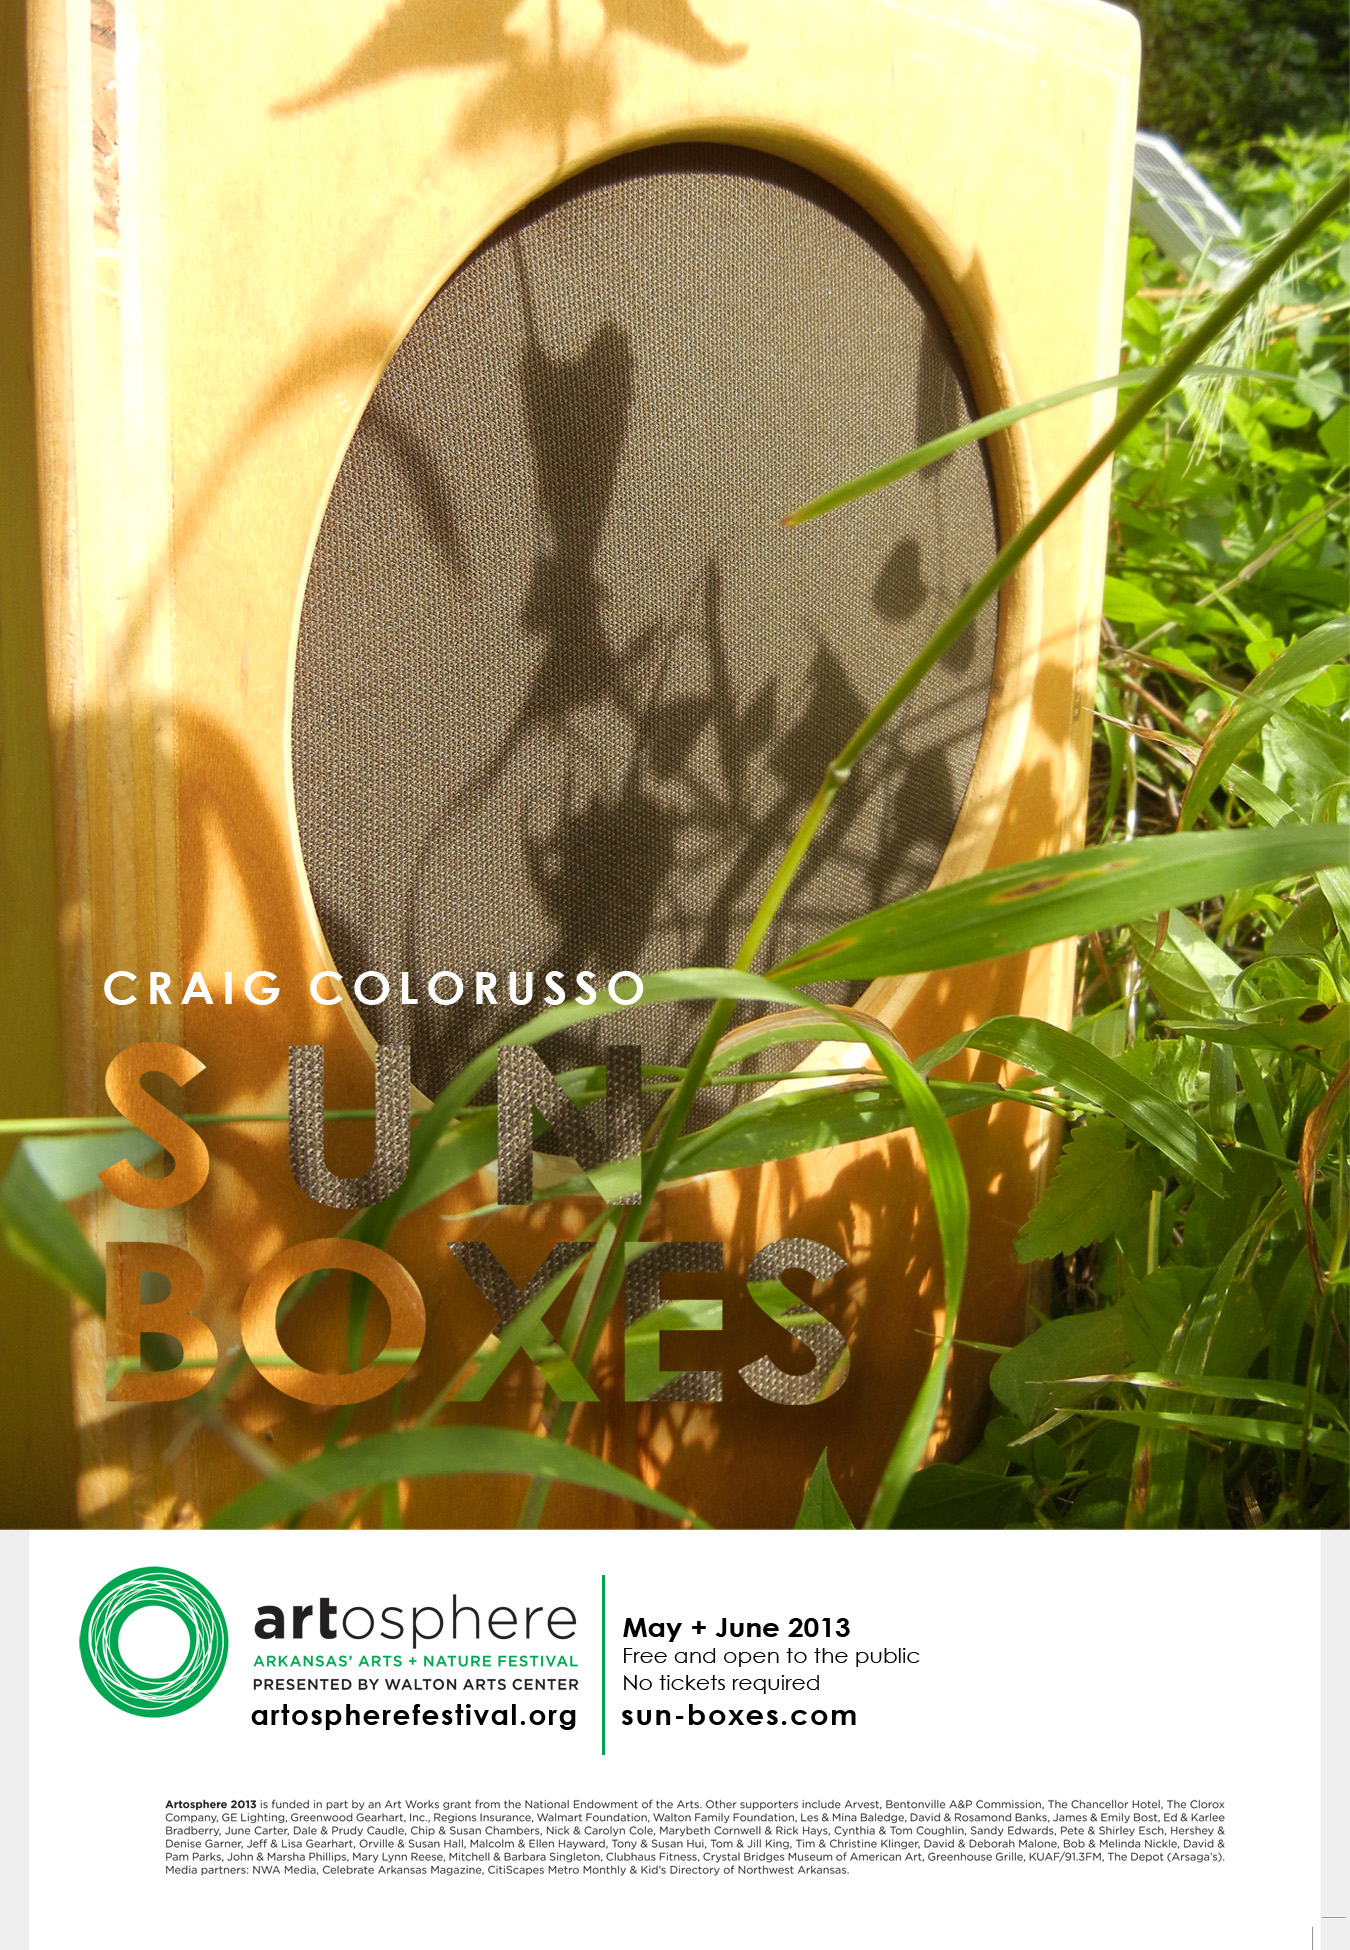 http://www.craigcolorusso.com/wp-content/uploads/2013/05/SunBoxes_Postcard_Front1_Option2.jpg